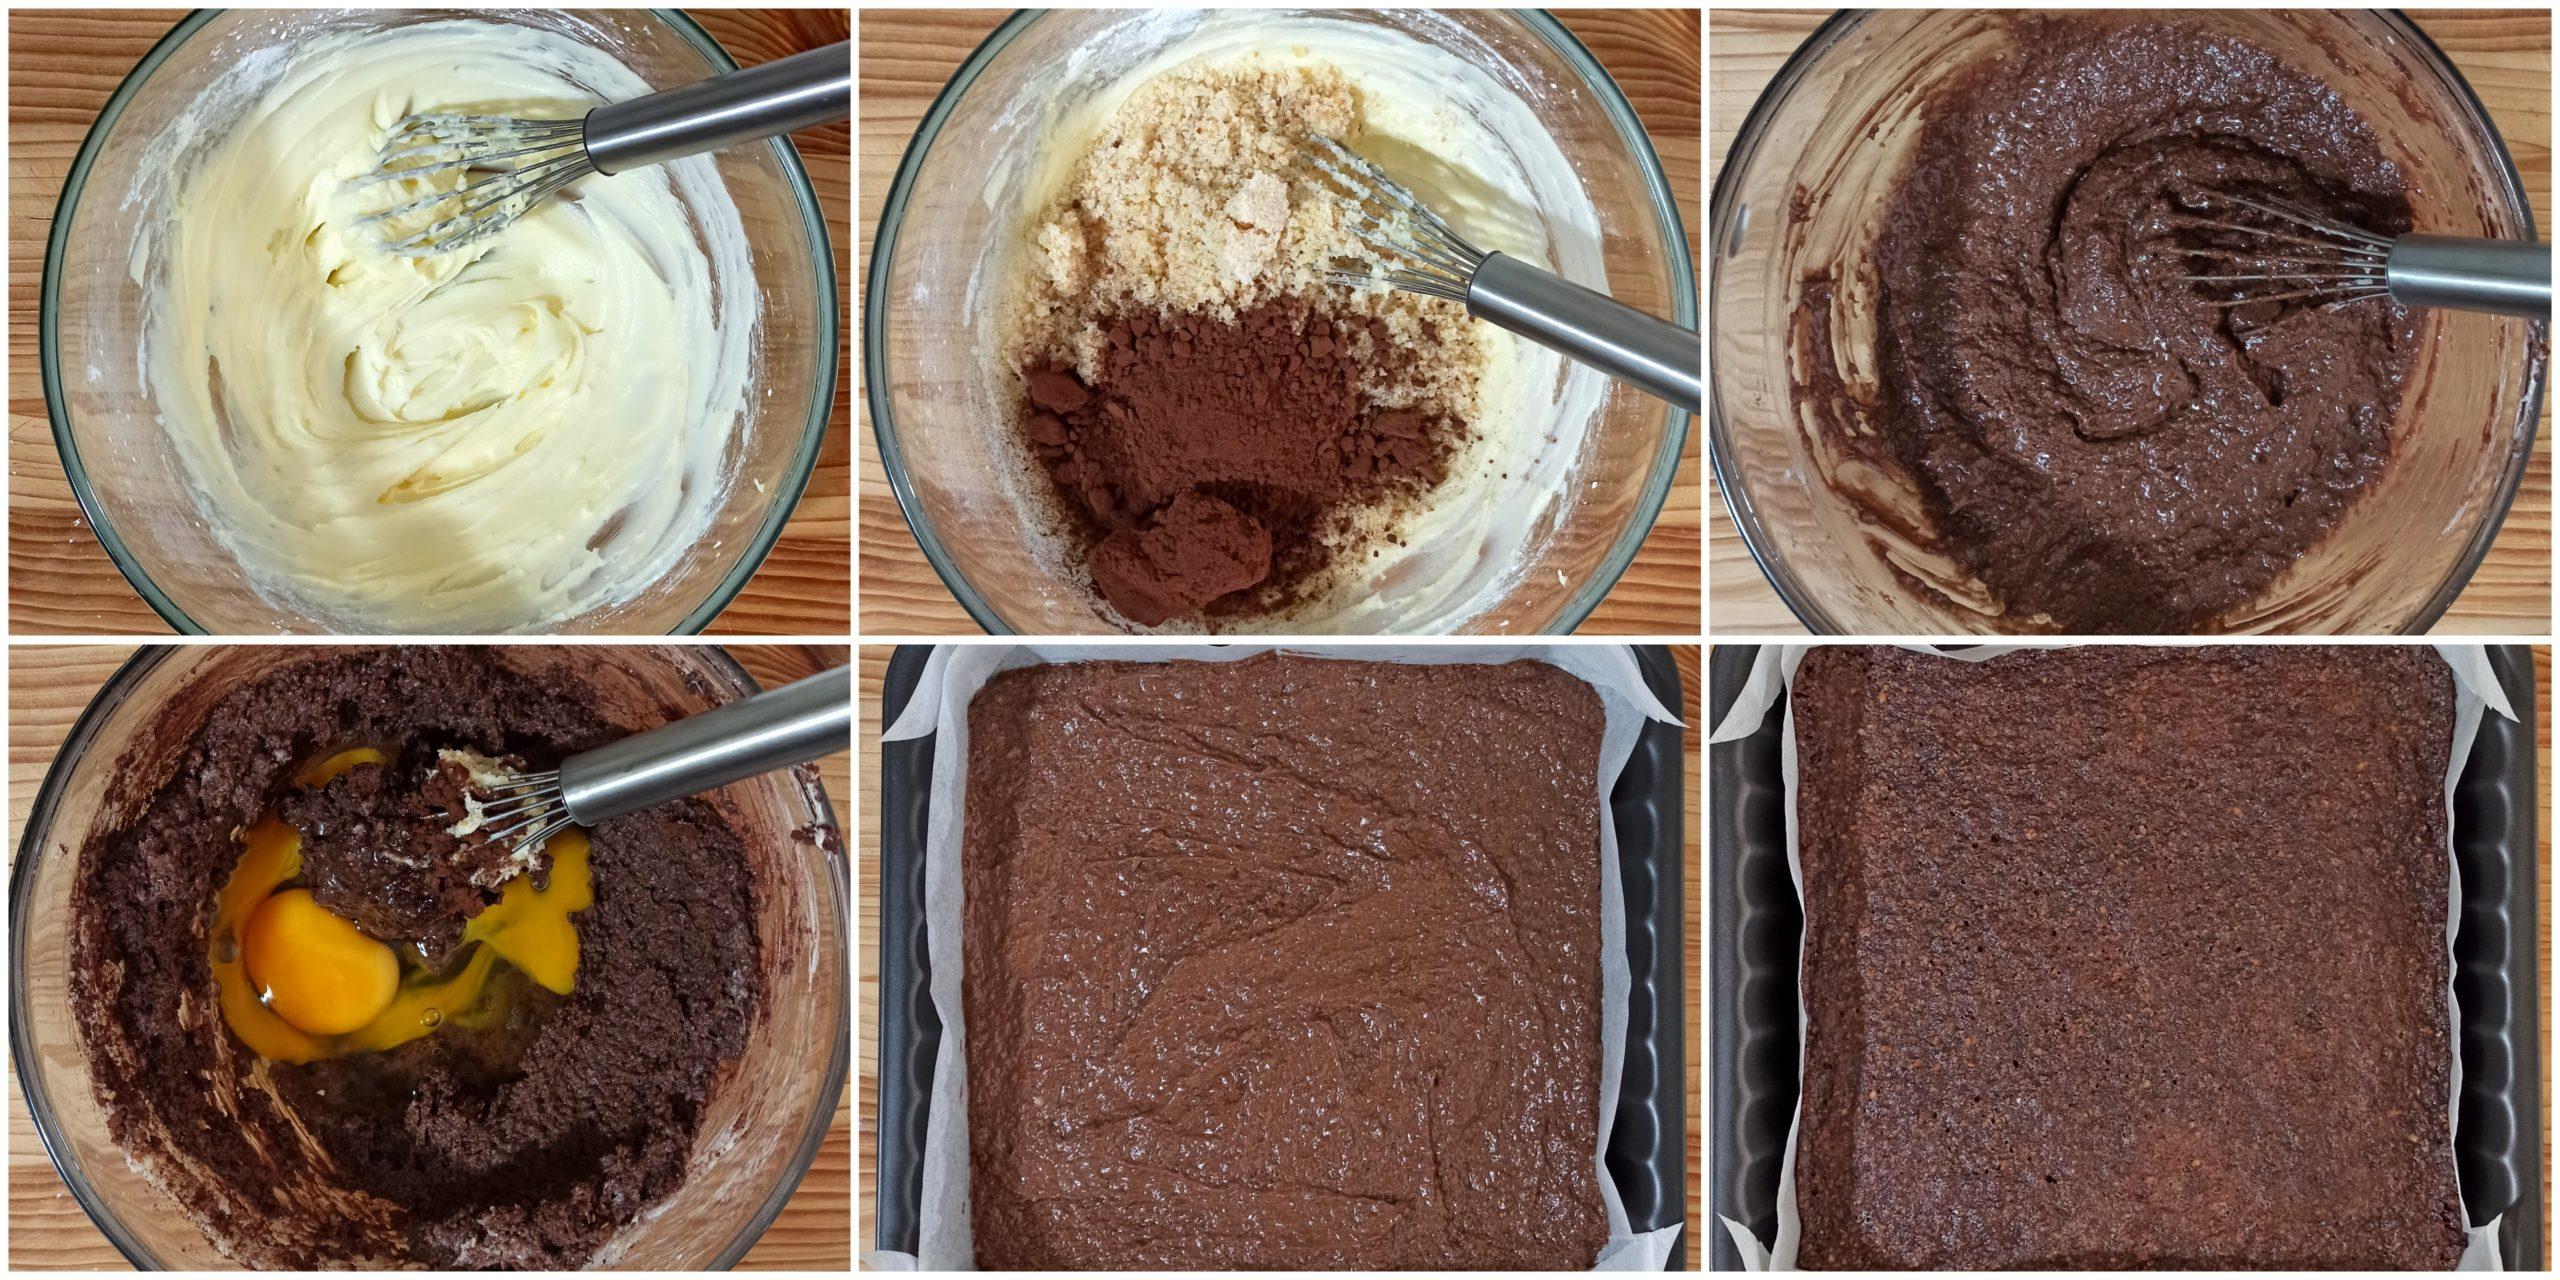 Barrette cioccoBarres choco-caramel sans gluten - La Cassata Celiaca